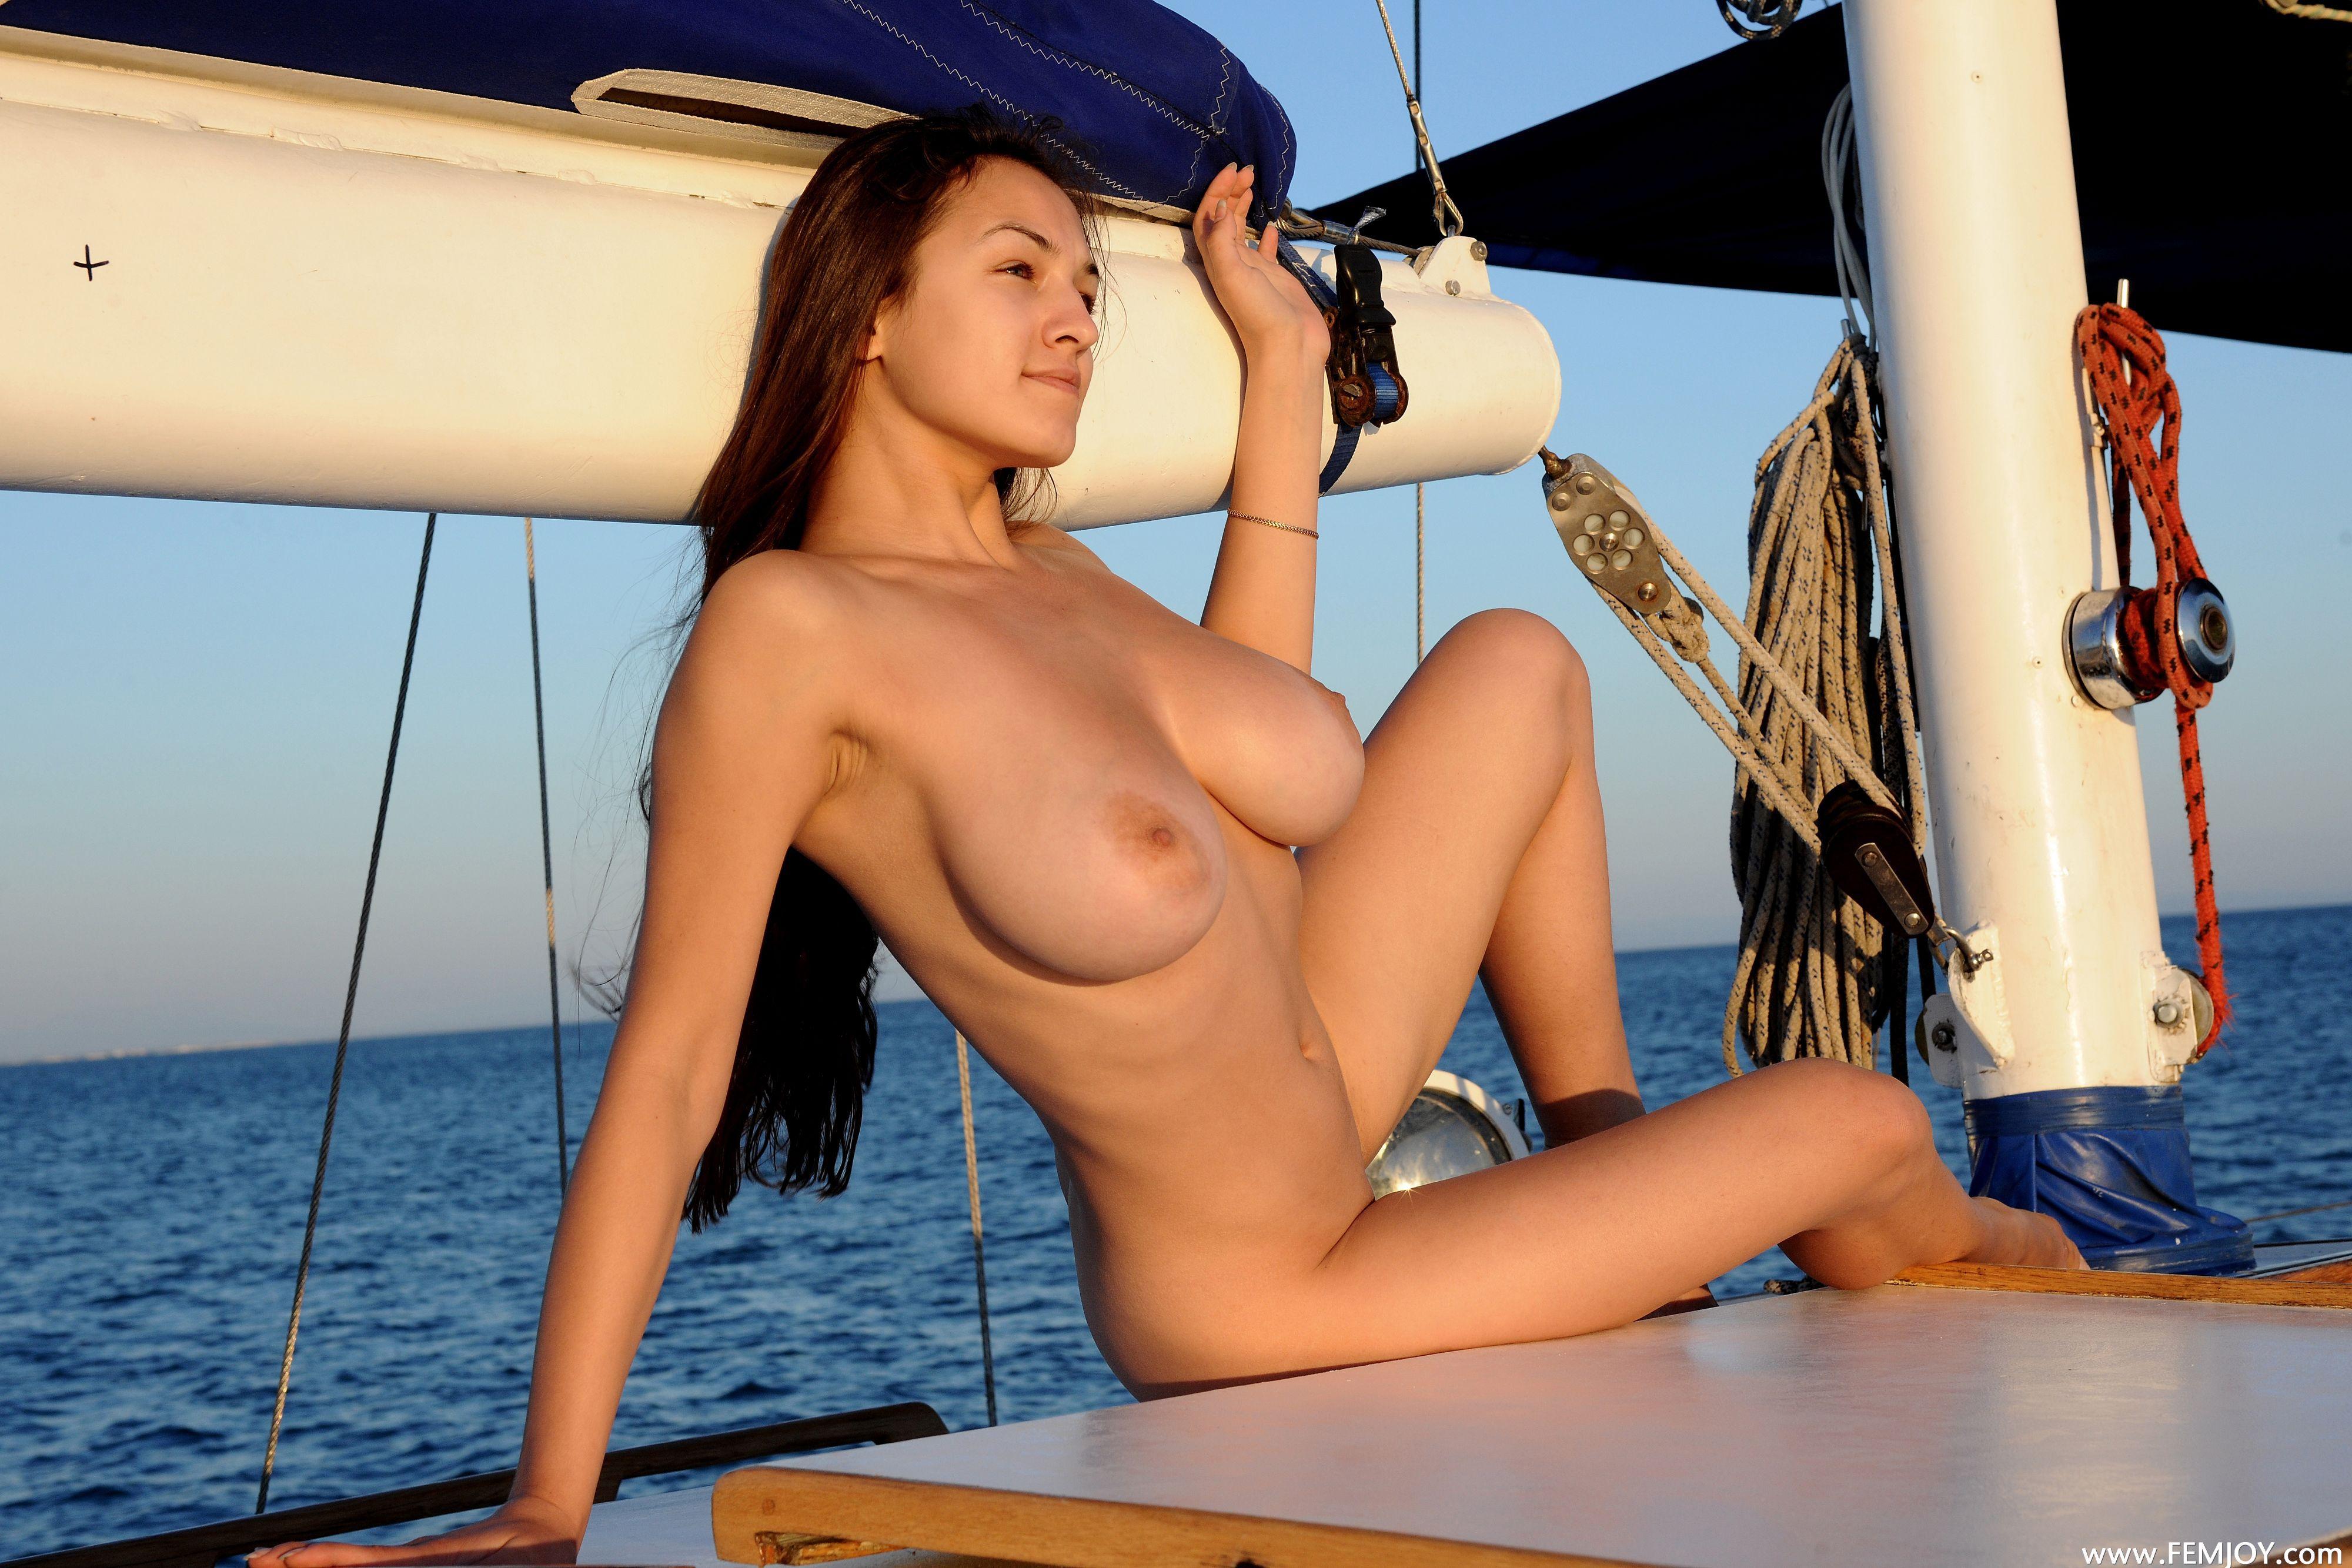 http://i2.imageban.ru/out/2013/08/14/deca50a5c7f996b72113203b716b7b10.jpg